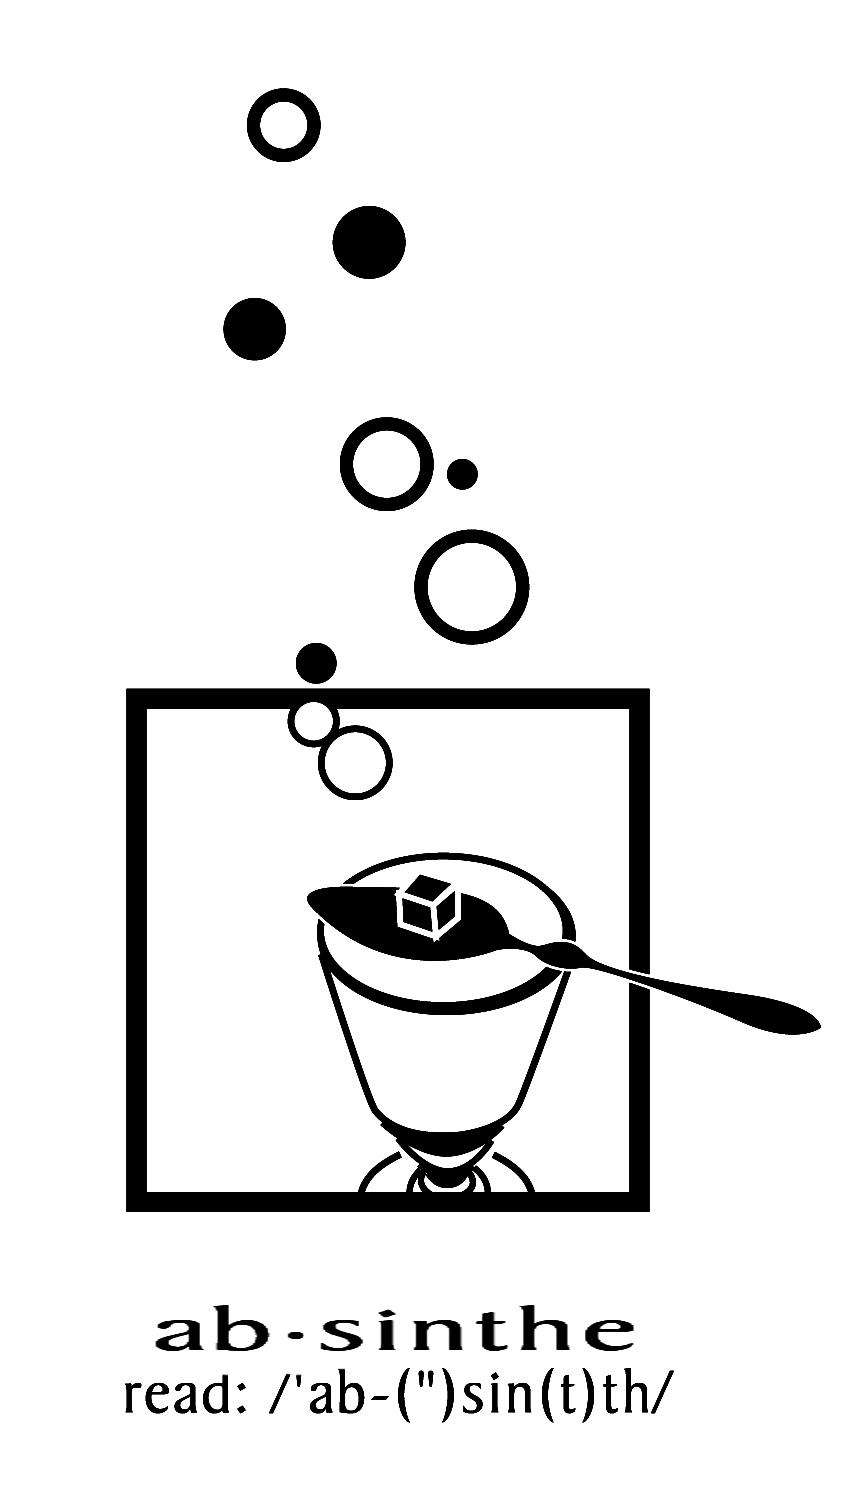 absinthe logo.jpg